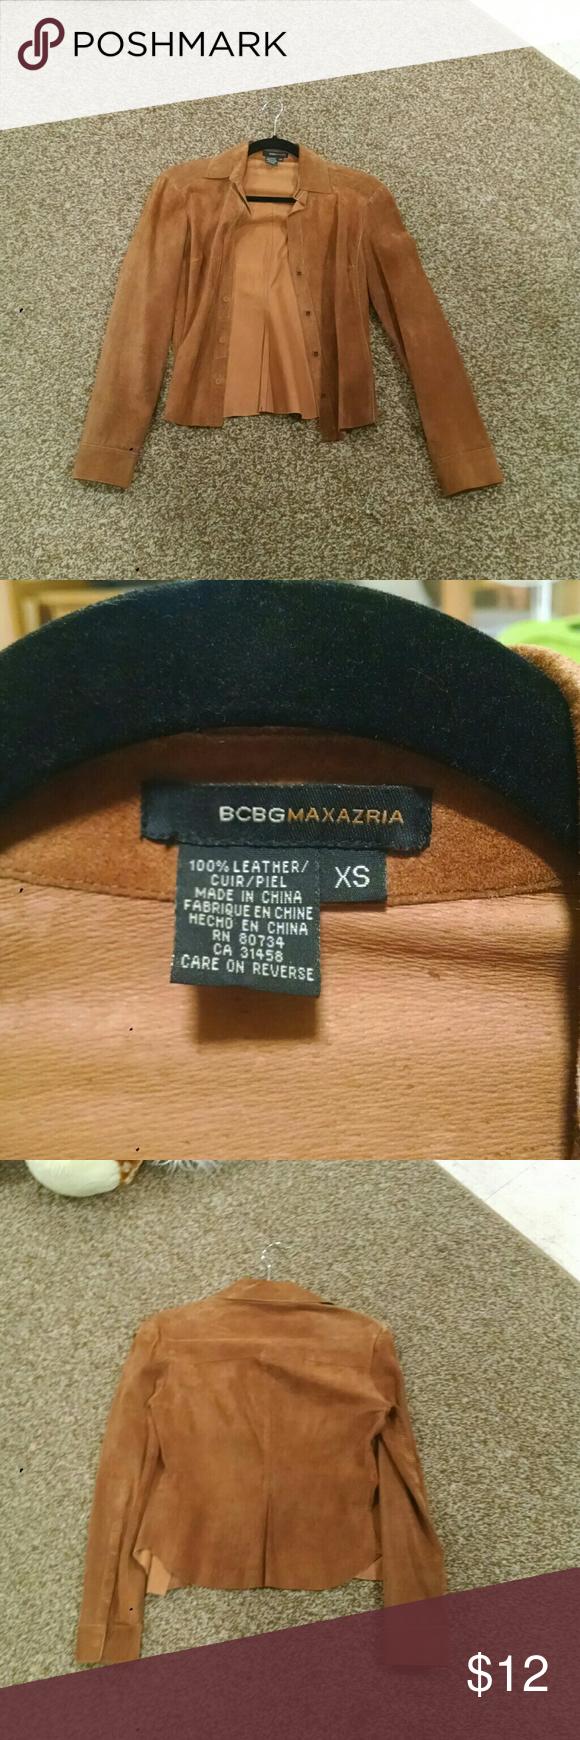 Selling this Leather bcbg max azria on Poshmark! My username is: emilyherch. #shopmycloset #poshmark #fashion #shopping #style #forsale #BCBGMaxAzria #Jackets & Blazers